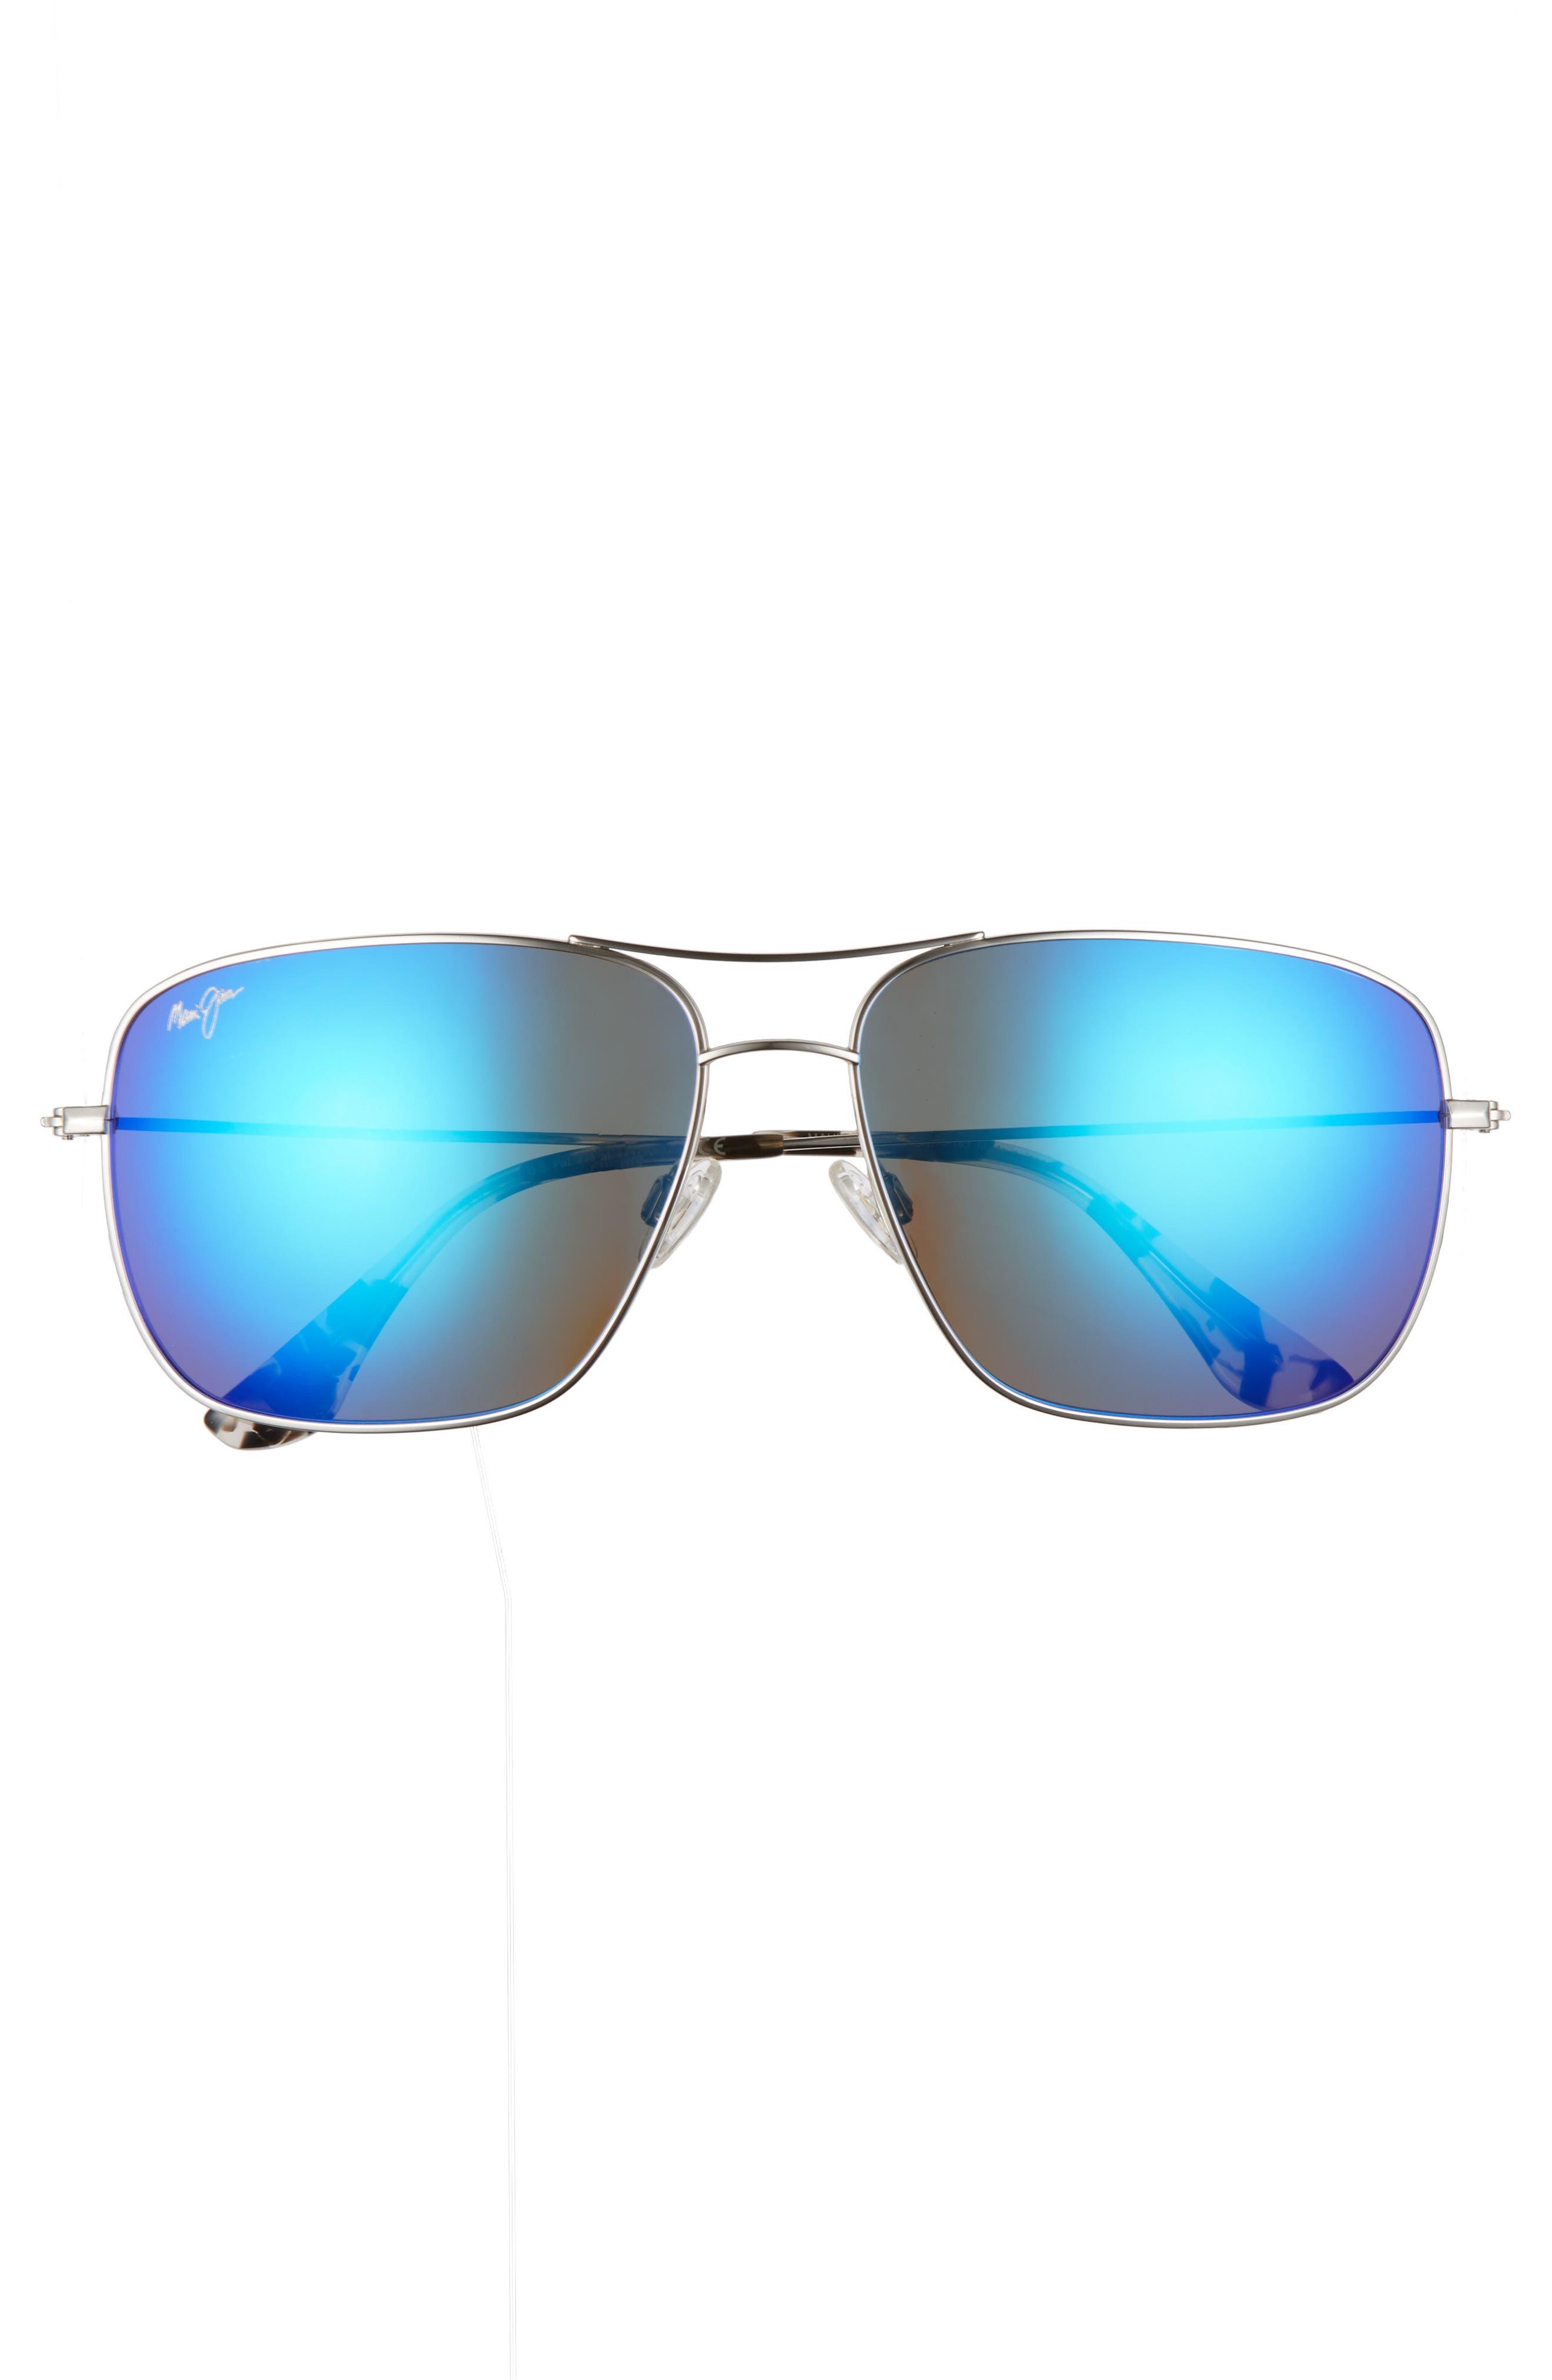 Cook Pines 63mm Polarized Titanium Aviator Sunglasses,                             Alternate thumbnail 3, color,                             Silver/ Blue Hawaii